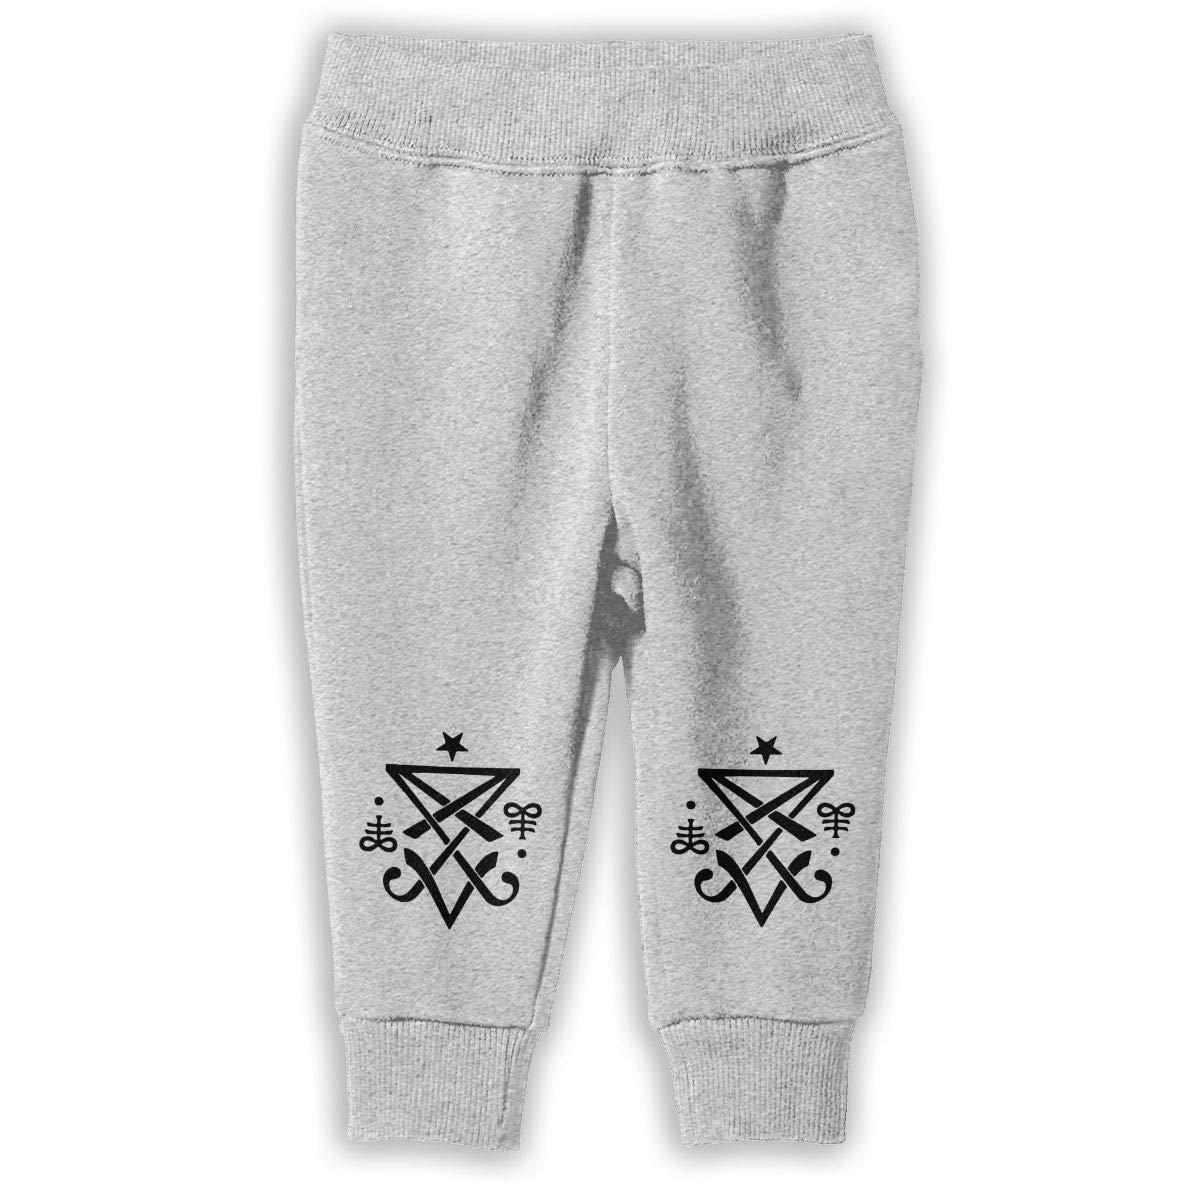 ShineFun Printed Occult Sigil of Lucifer Satanic Child Boys /& Girls Unisex Sports Sweatpants